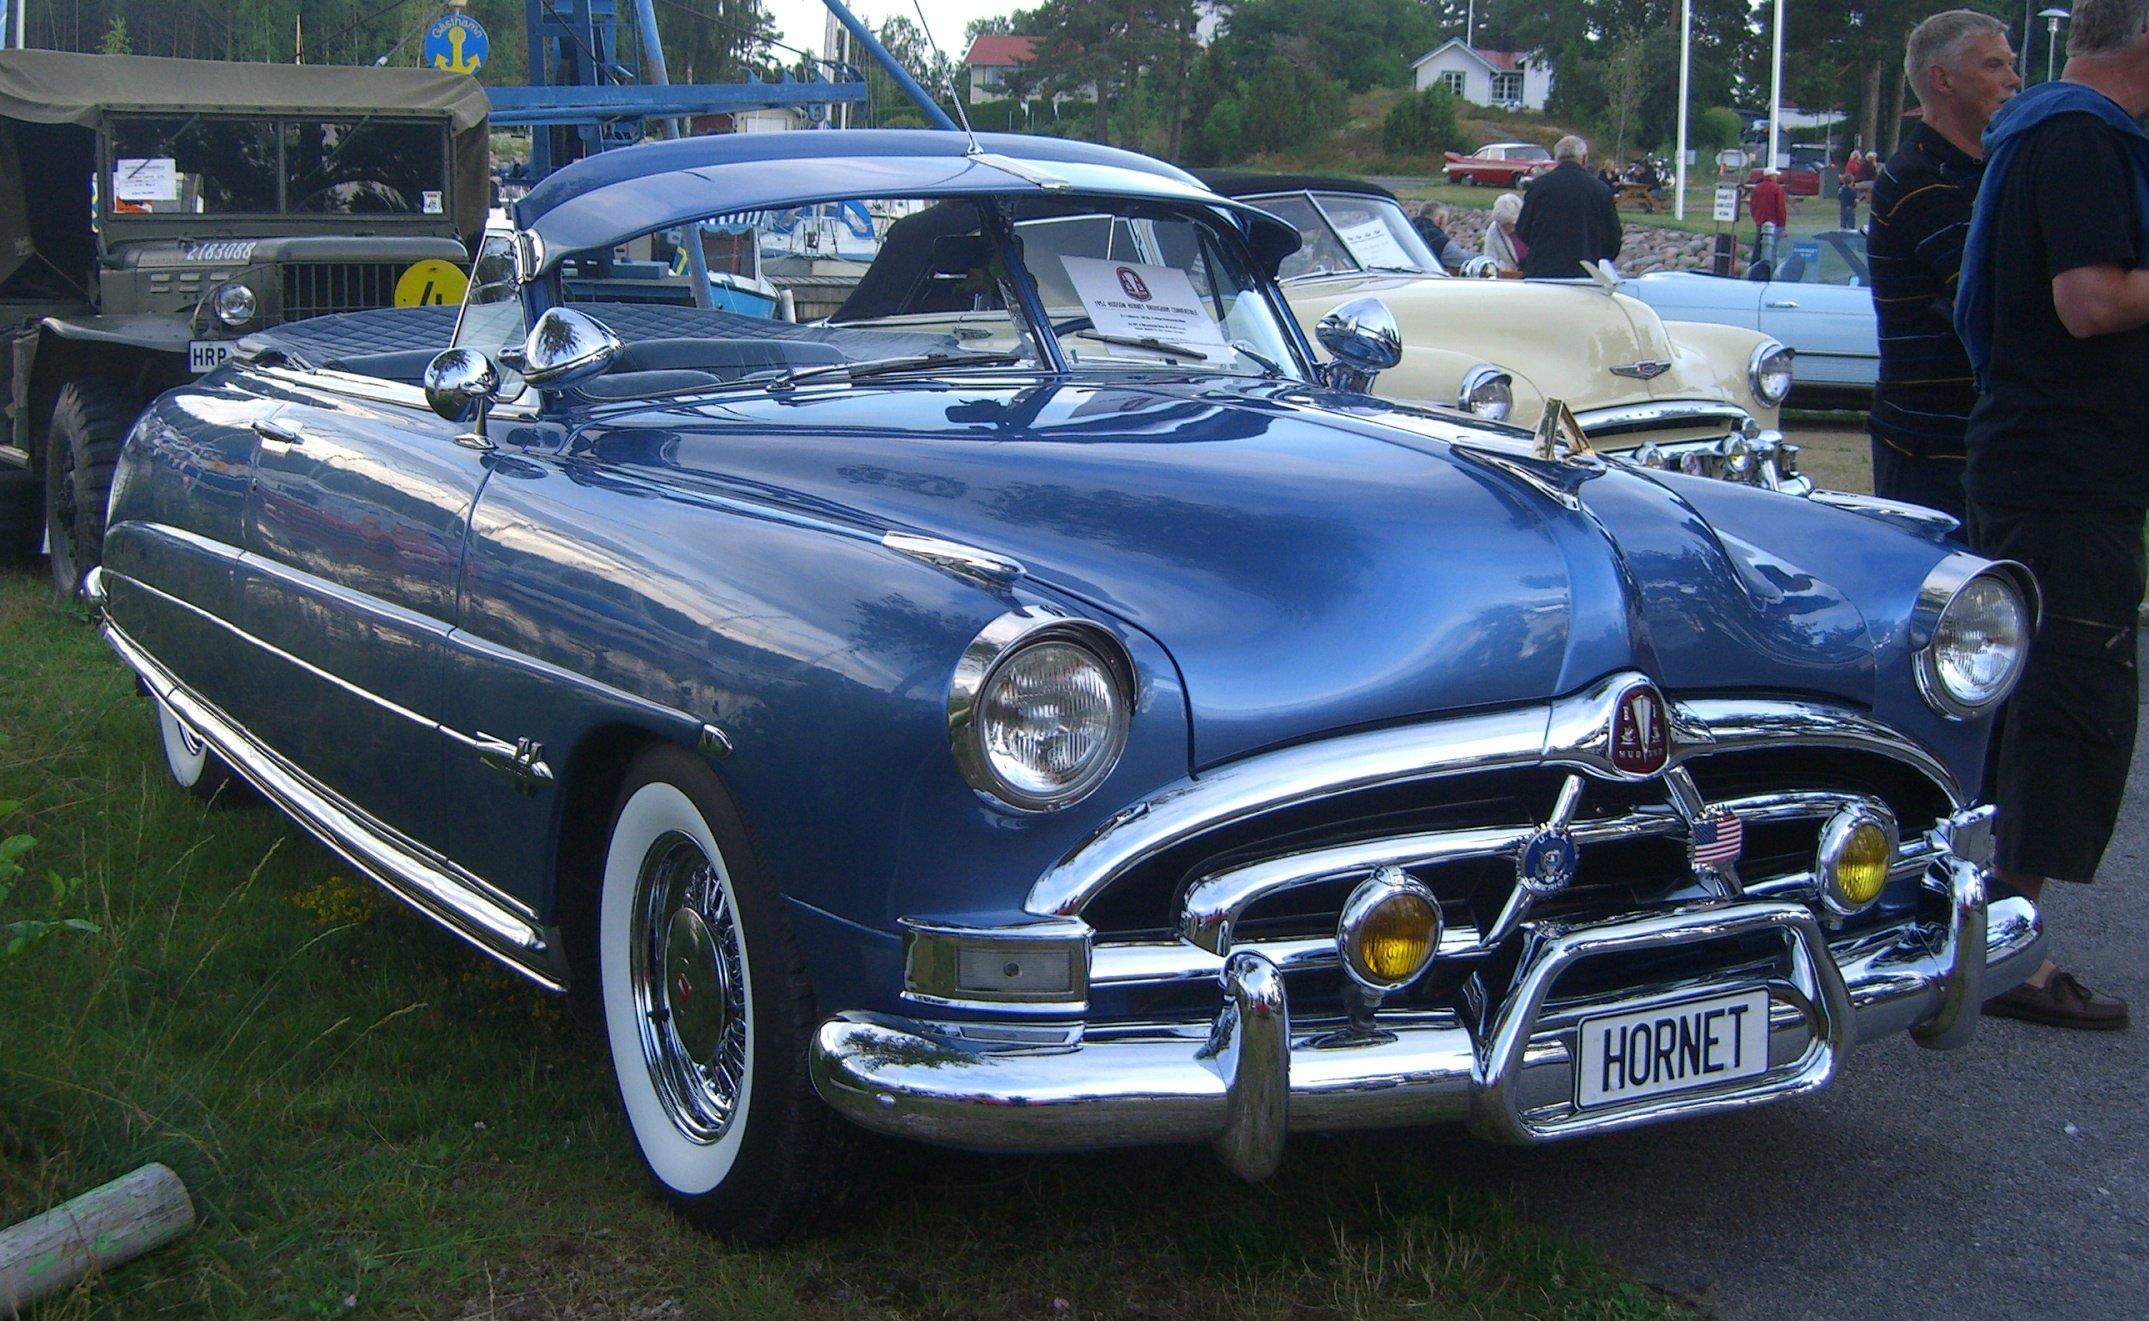 Hornet club coupe gta 4 hudson for Hudson county motor vehicle